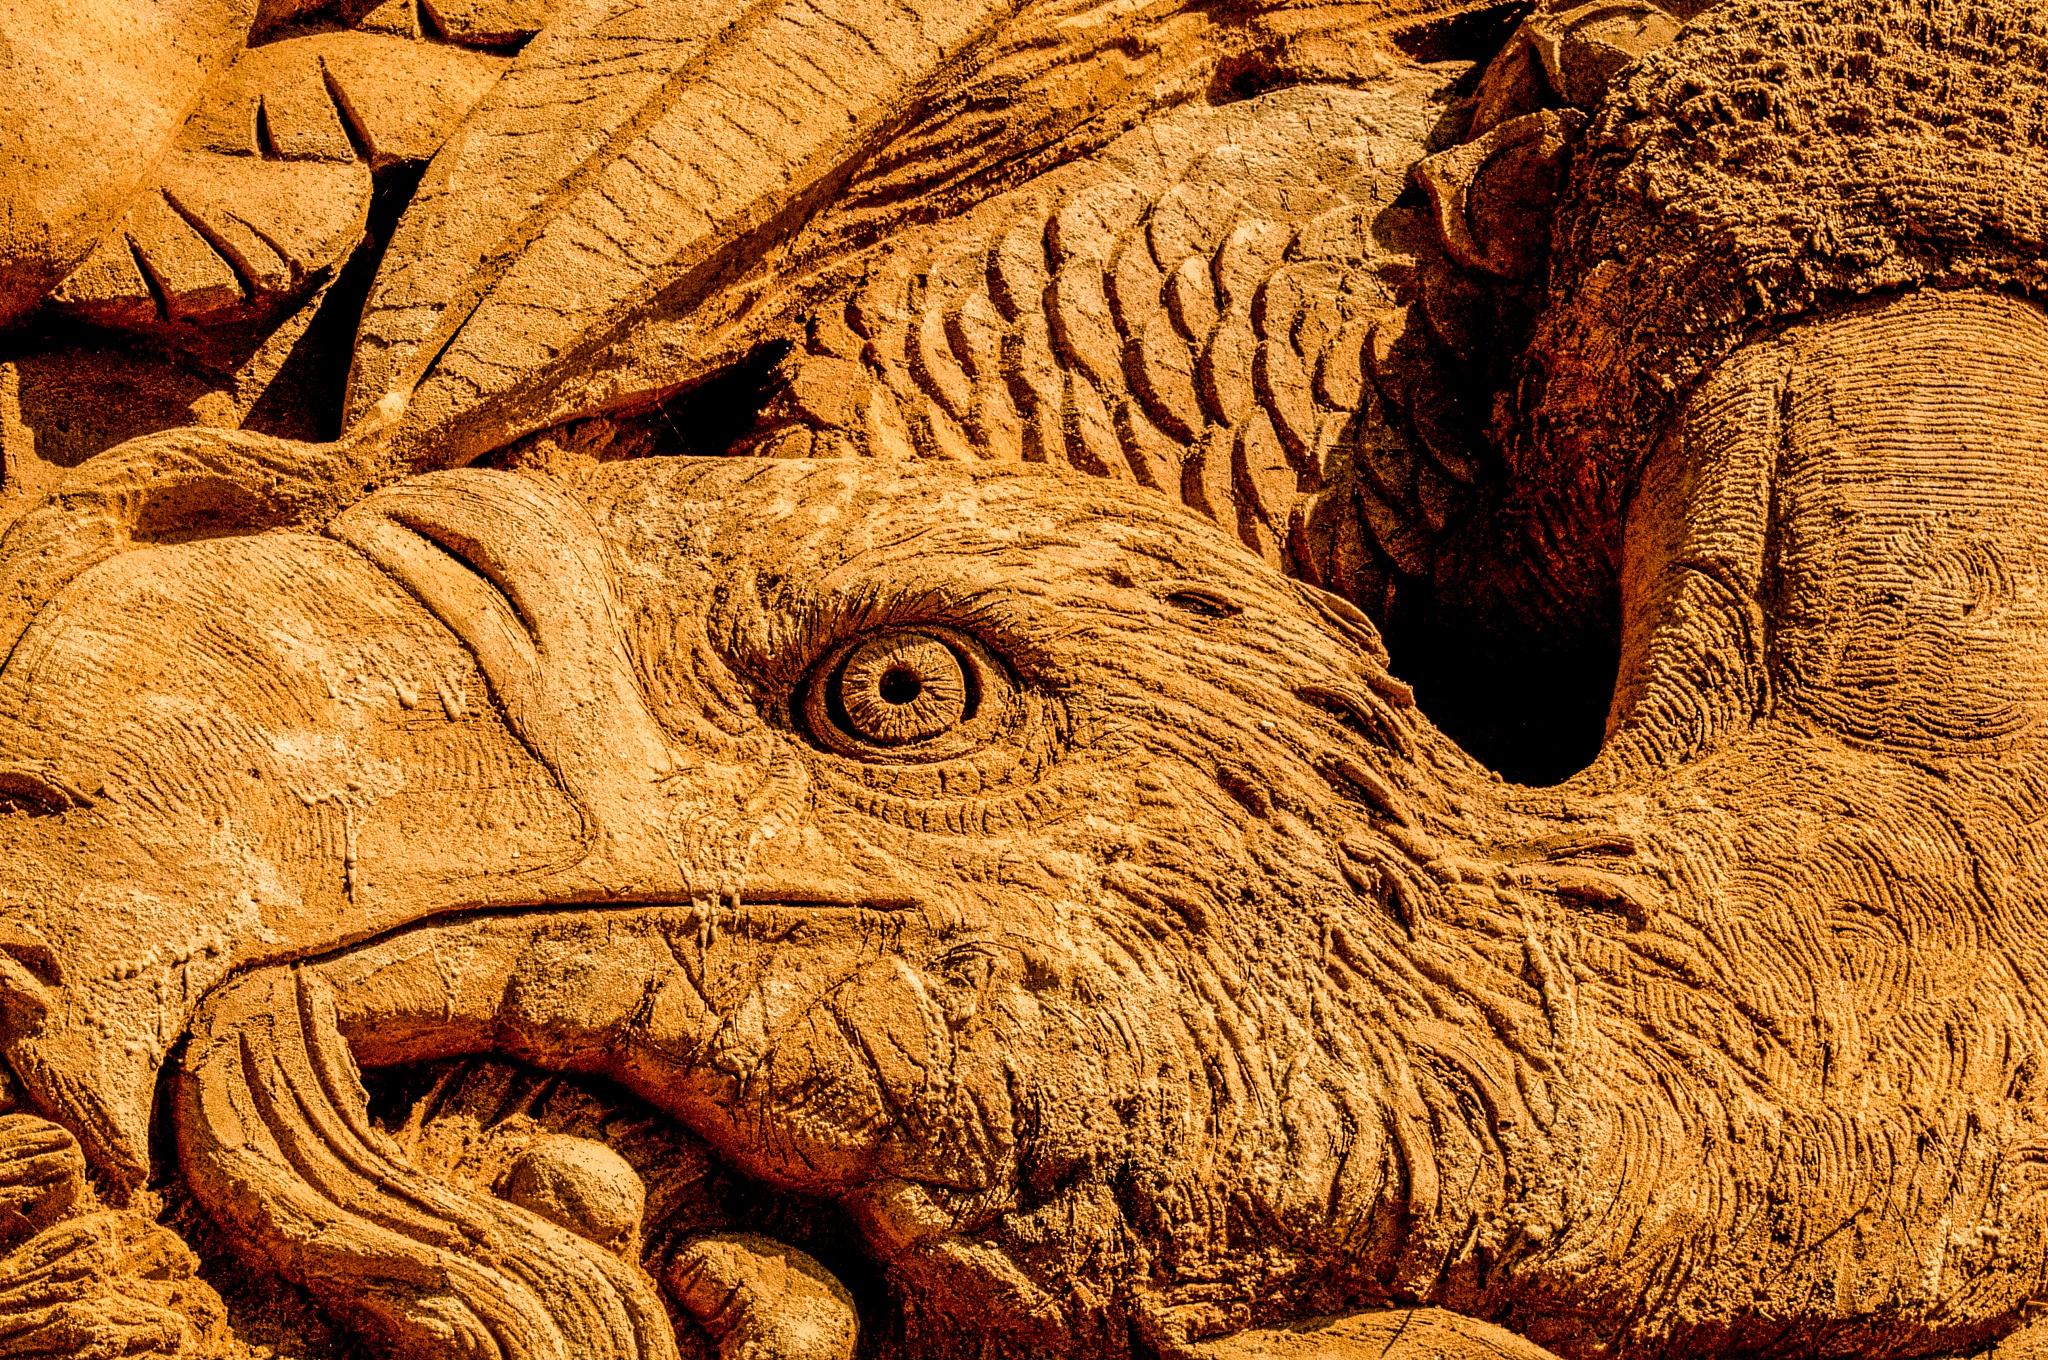 Vulture closeup by Steen Skov